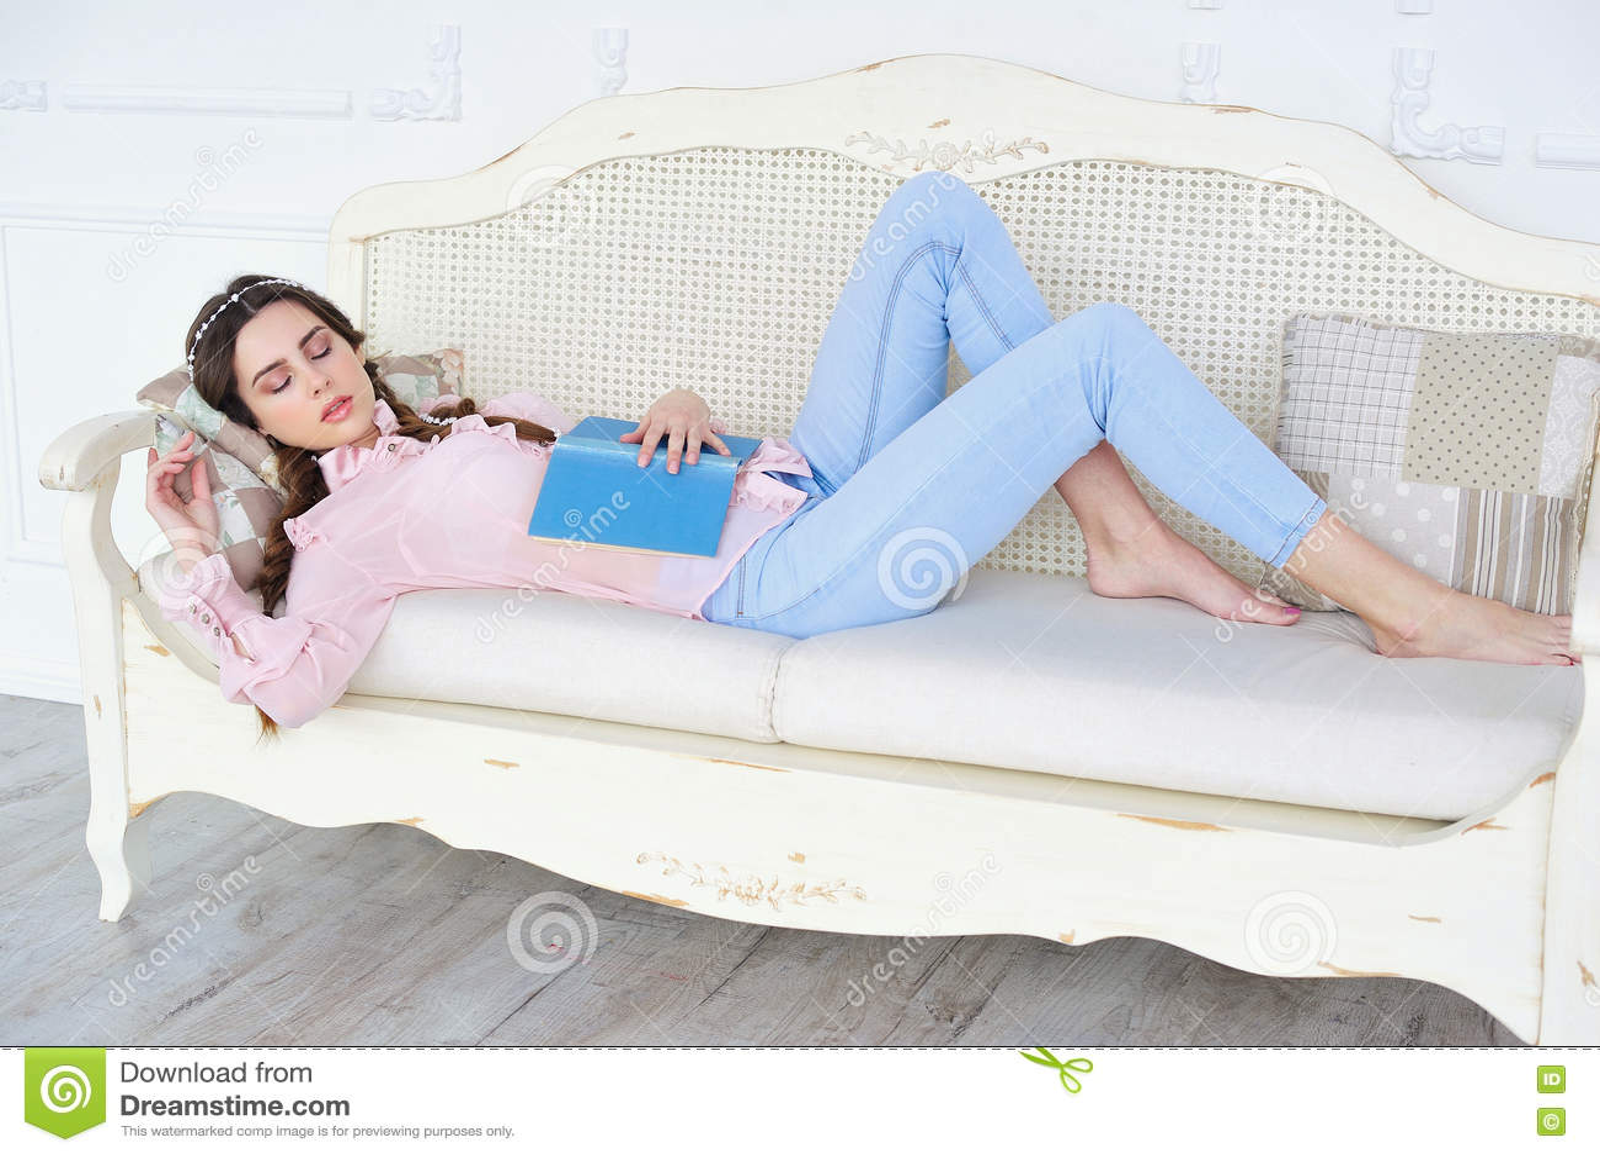 photos of young girls sleeping